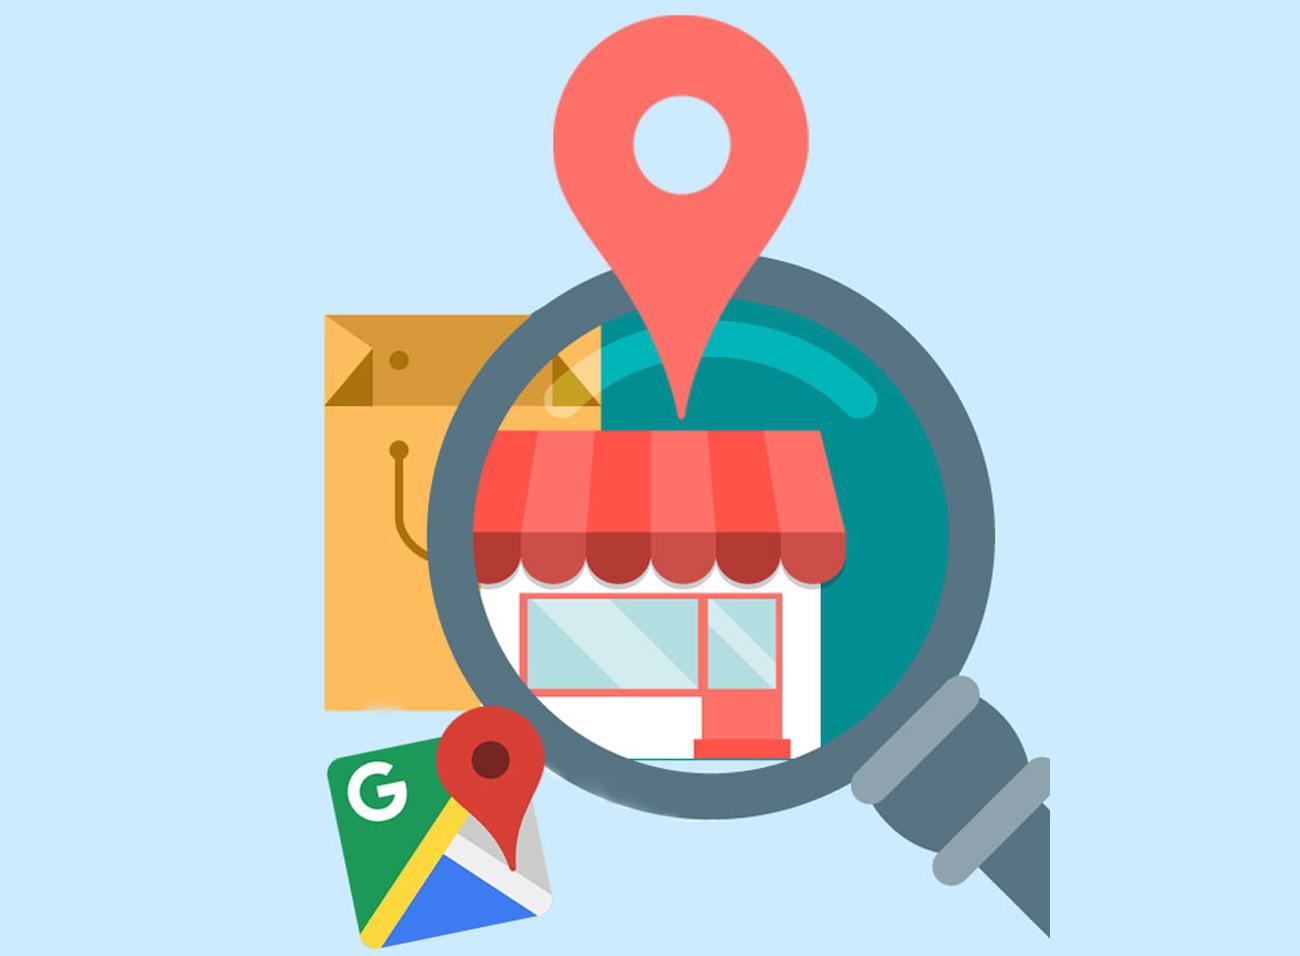 Presence of Google my business